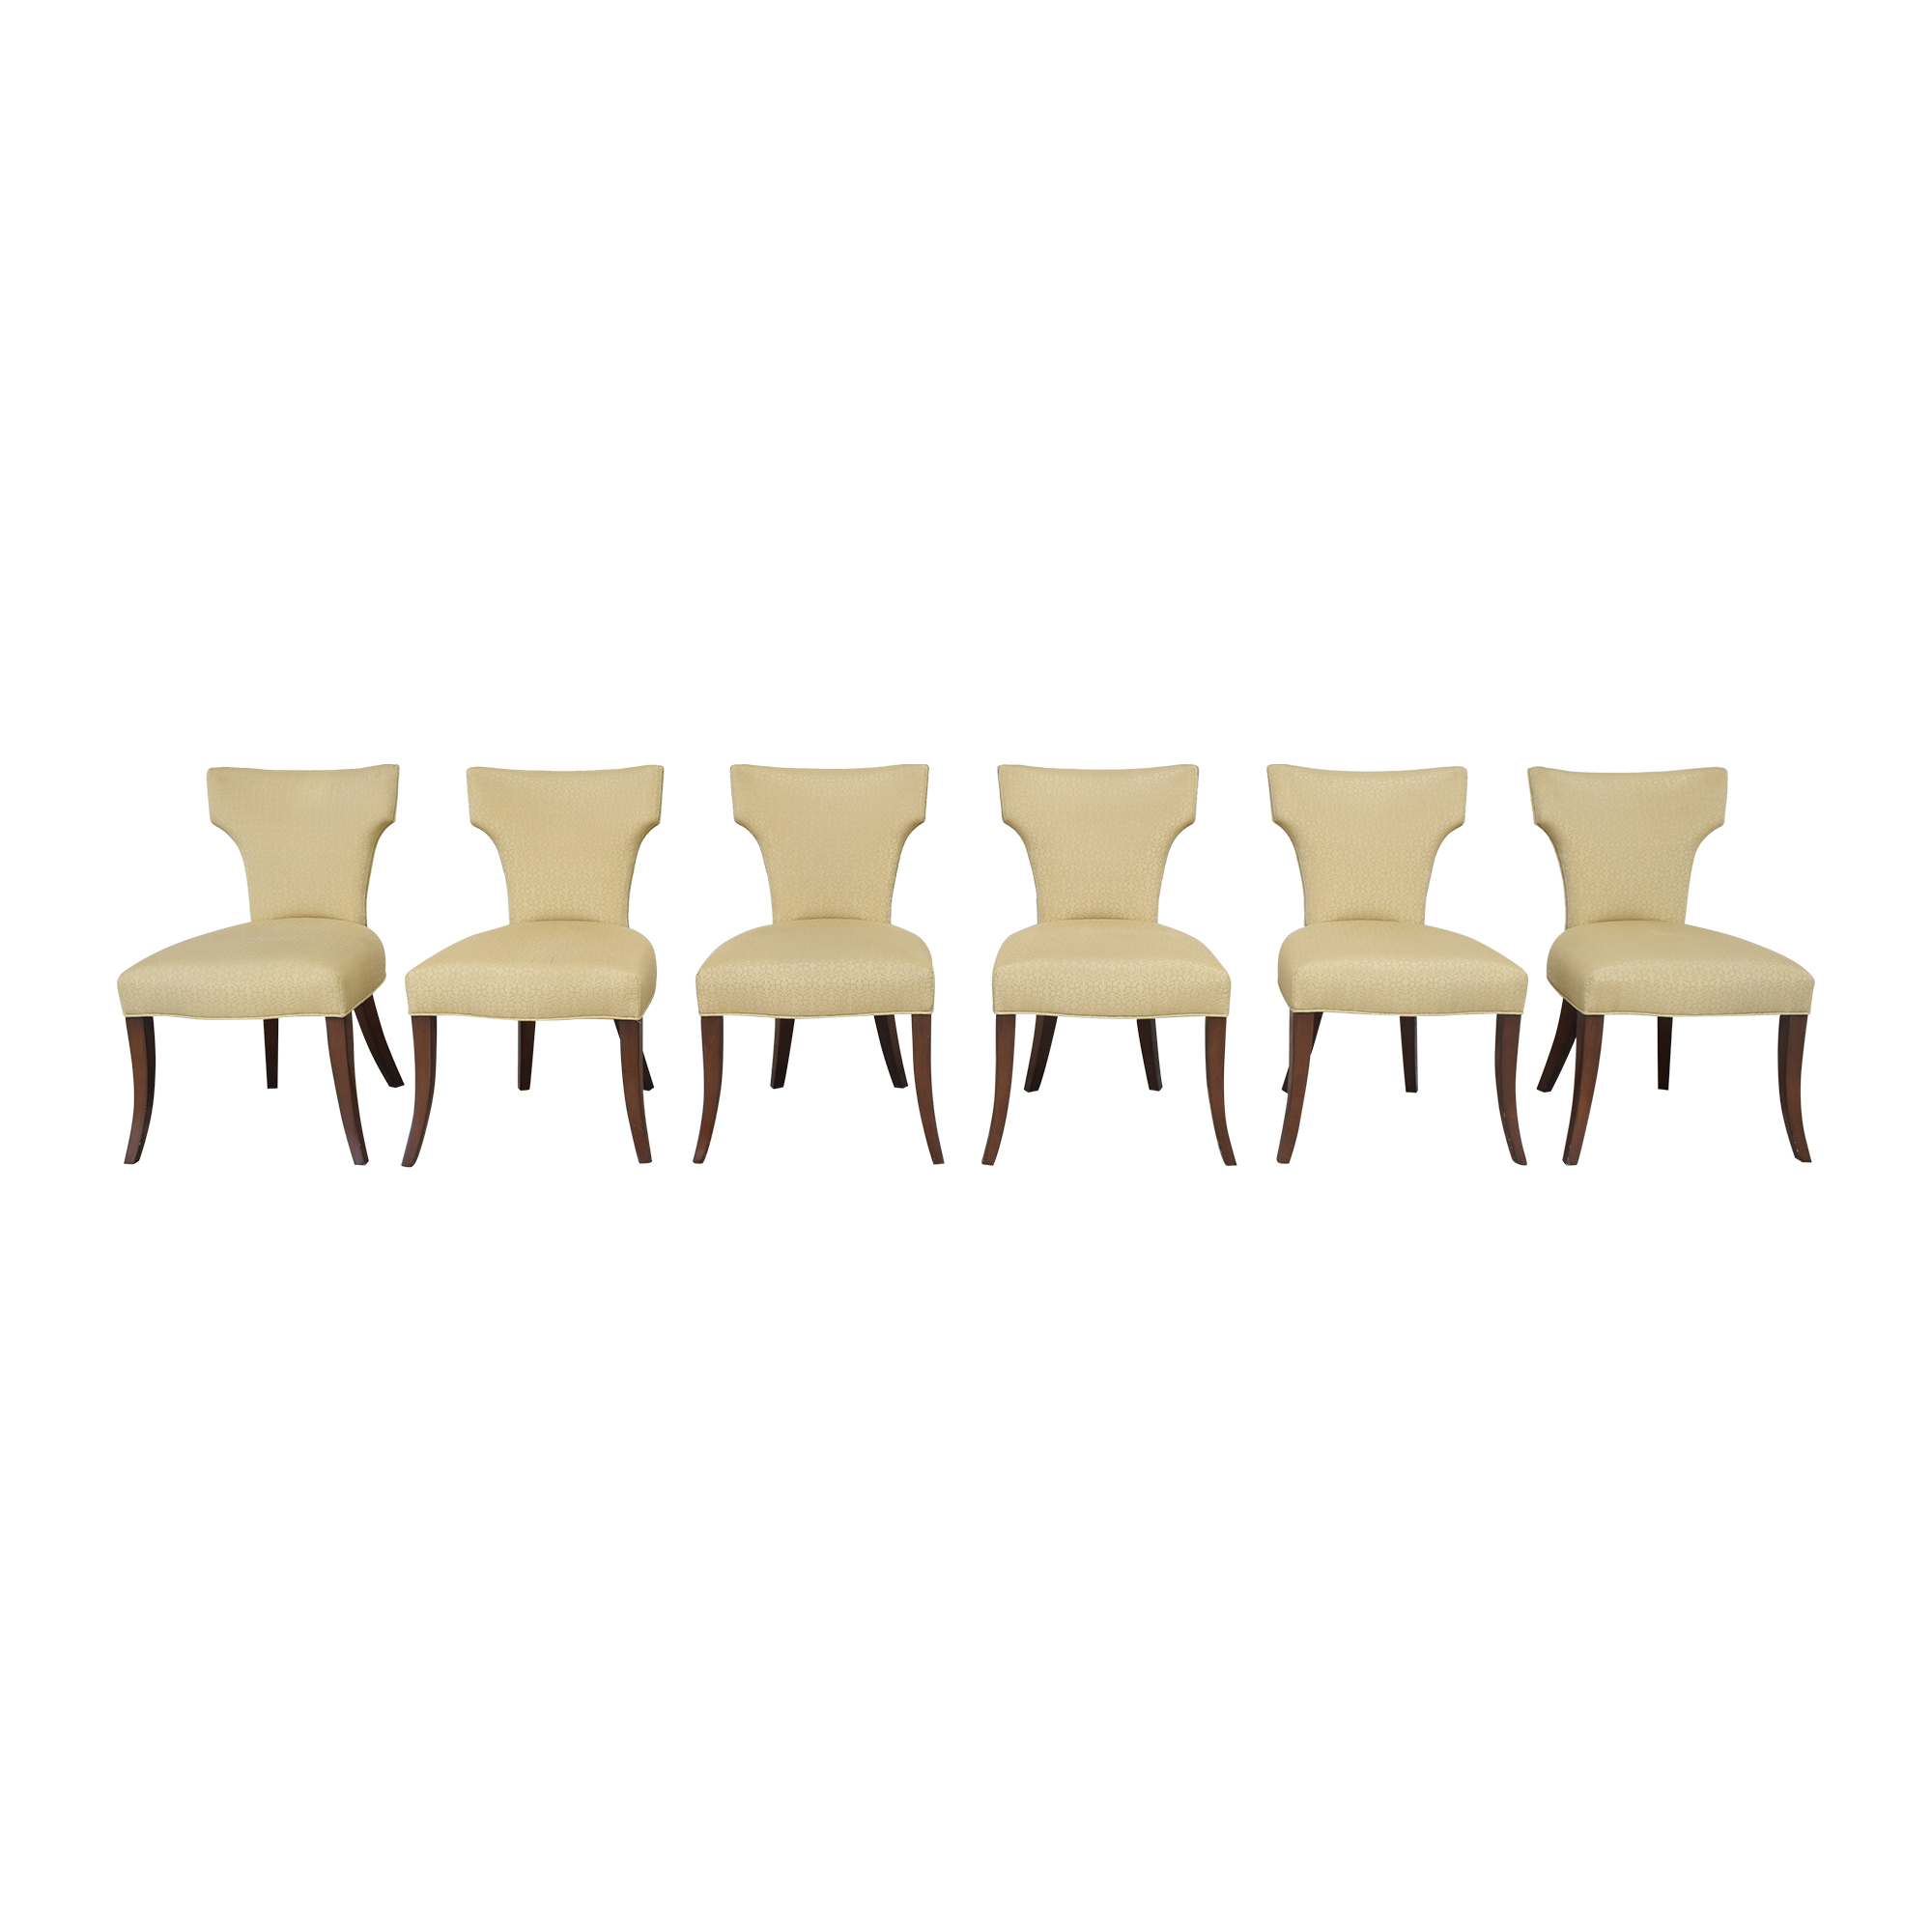 buy Ferrell Mittman Custom Wing Dining Chairs Ferrell Mittman